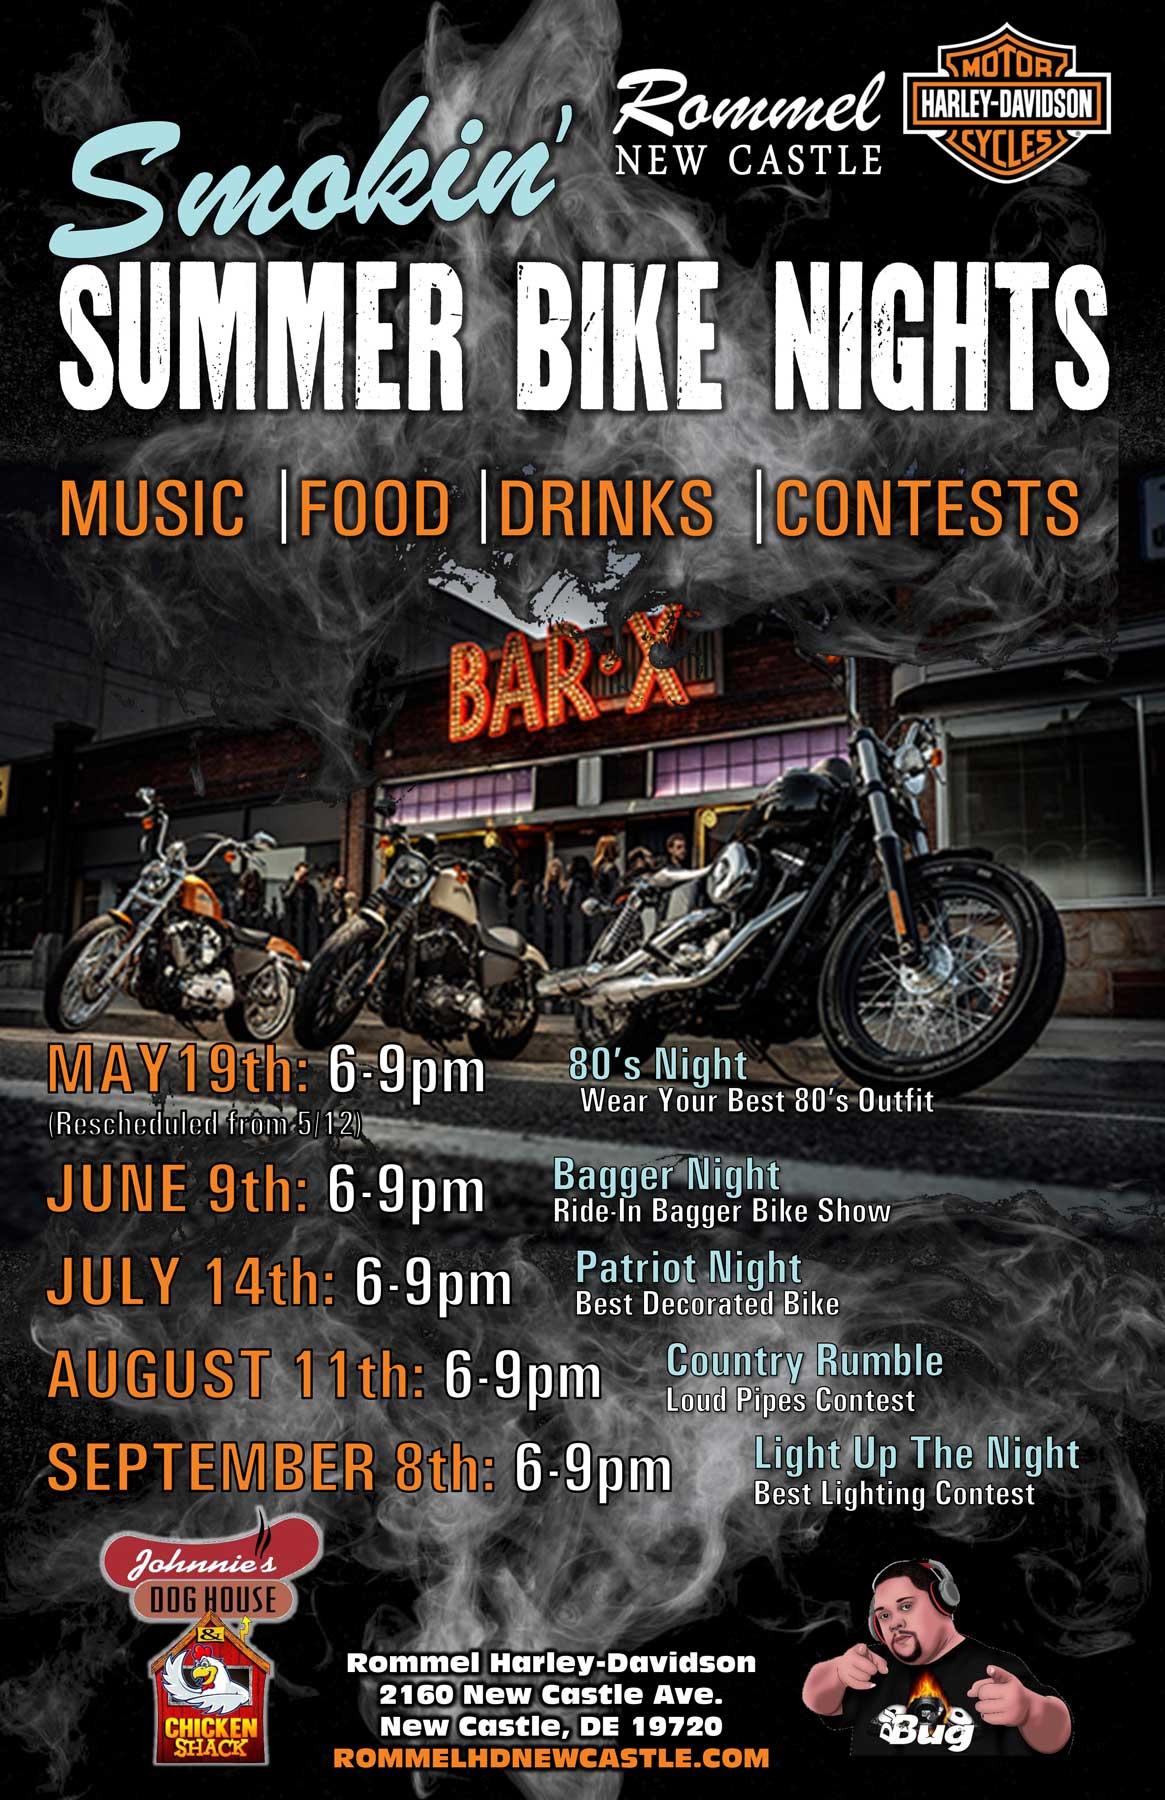 Smokin' Summer Bike Nights @ New Castle